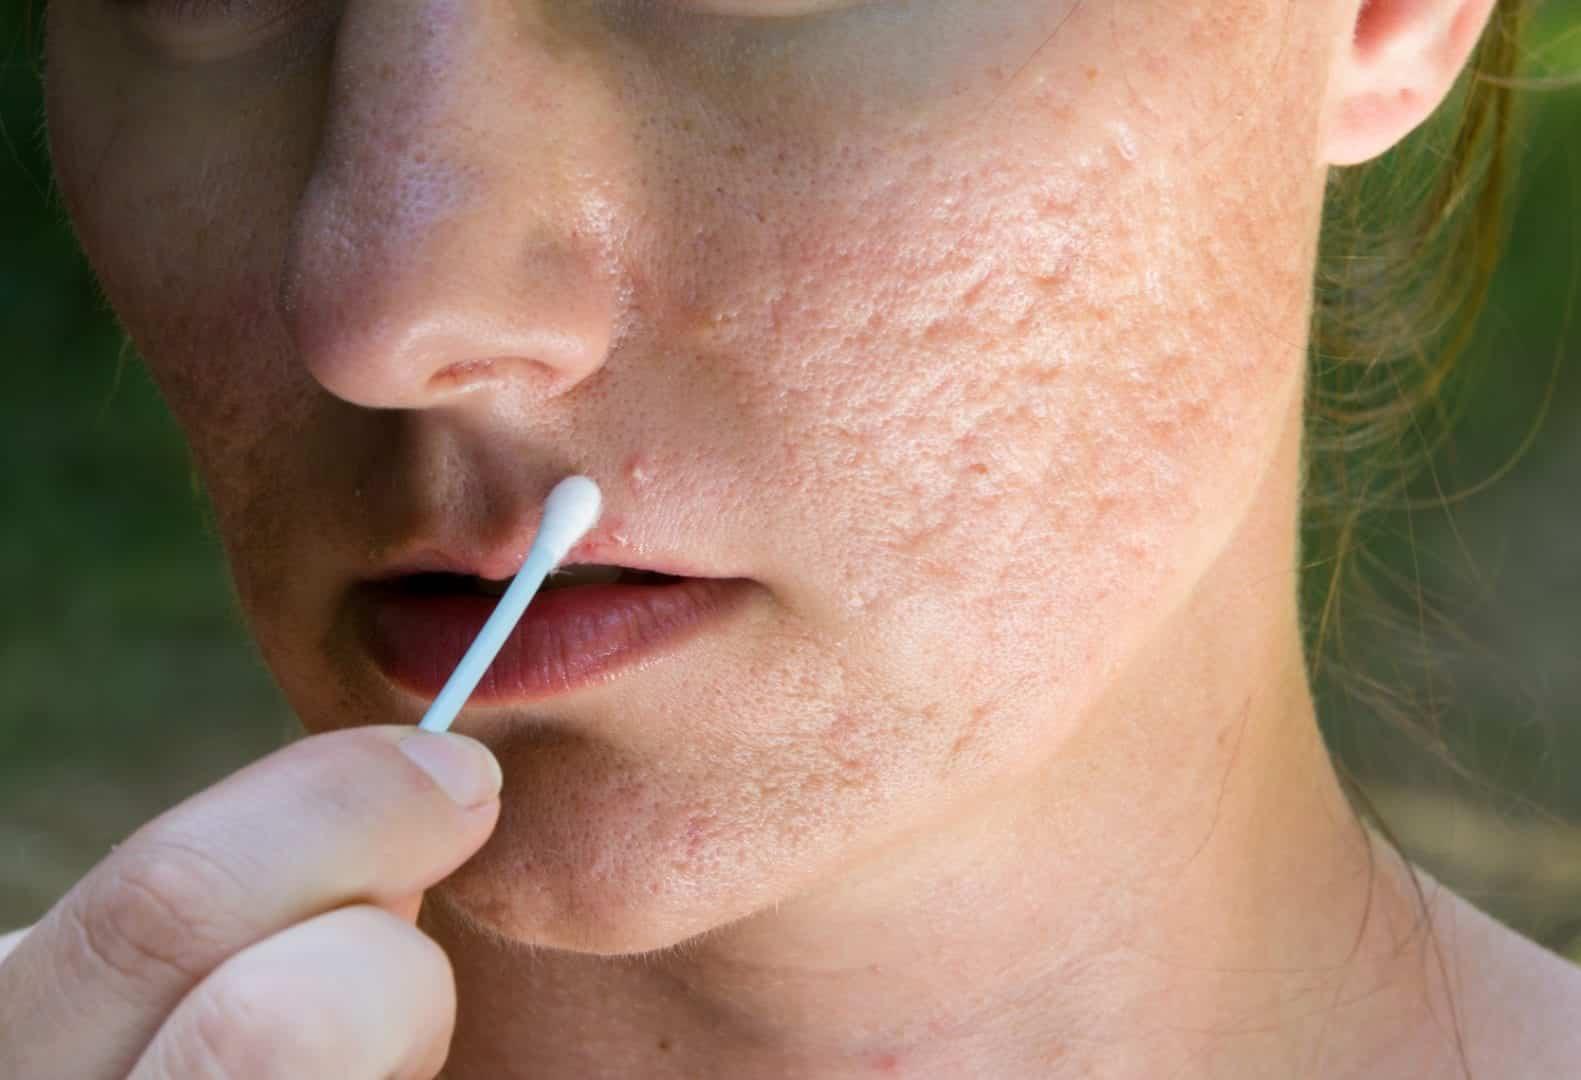 Como secar espinha - 8 tratamentos caseiros eficazes